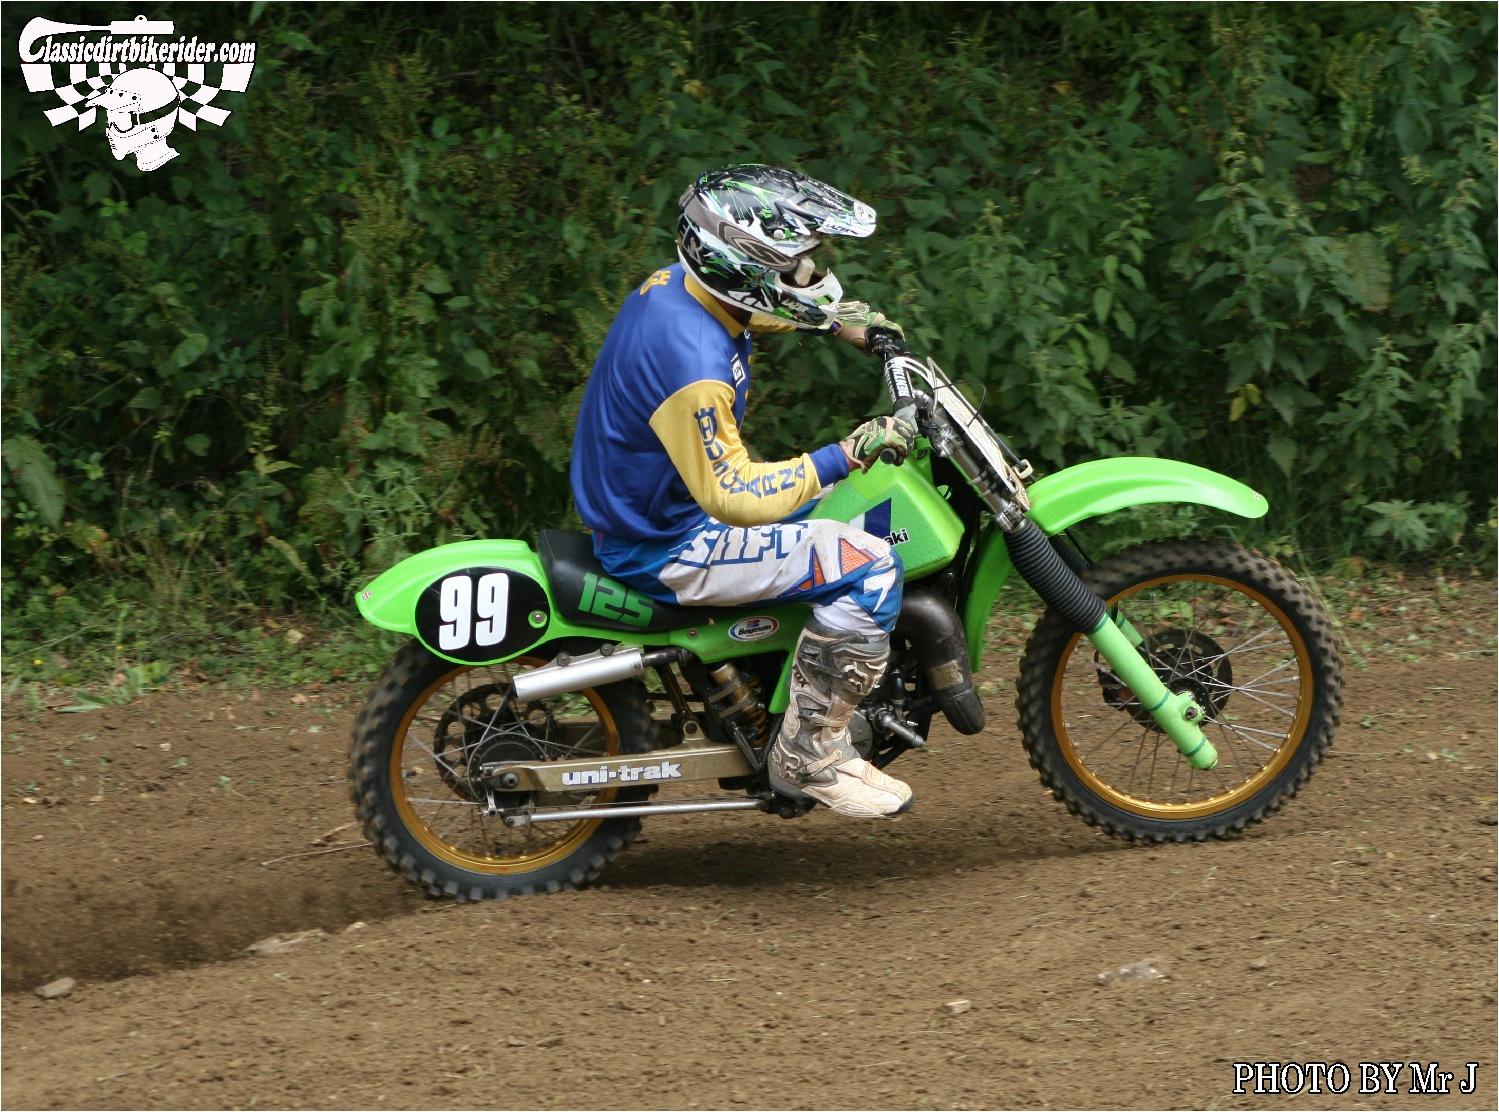 MX Vintage Bonanza 2015 Ford Moto Park July 19th classicdirtbikerider.com 108